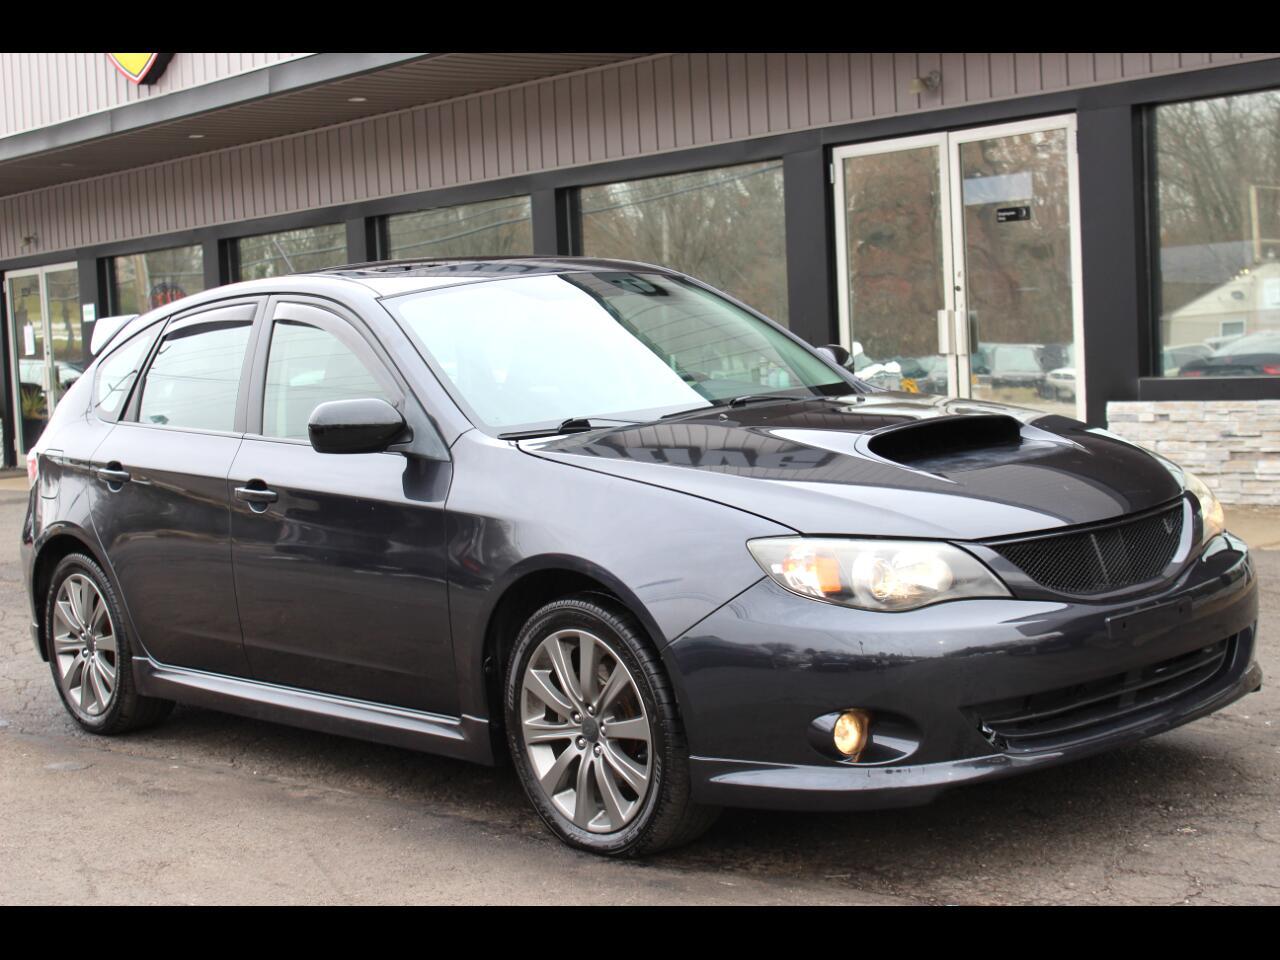 2009 Subaru Impreza WRX Wagon Premium